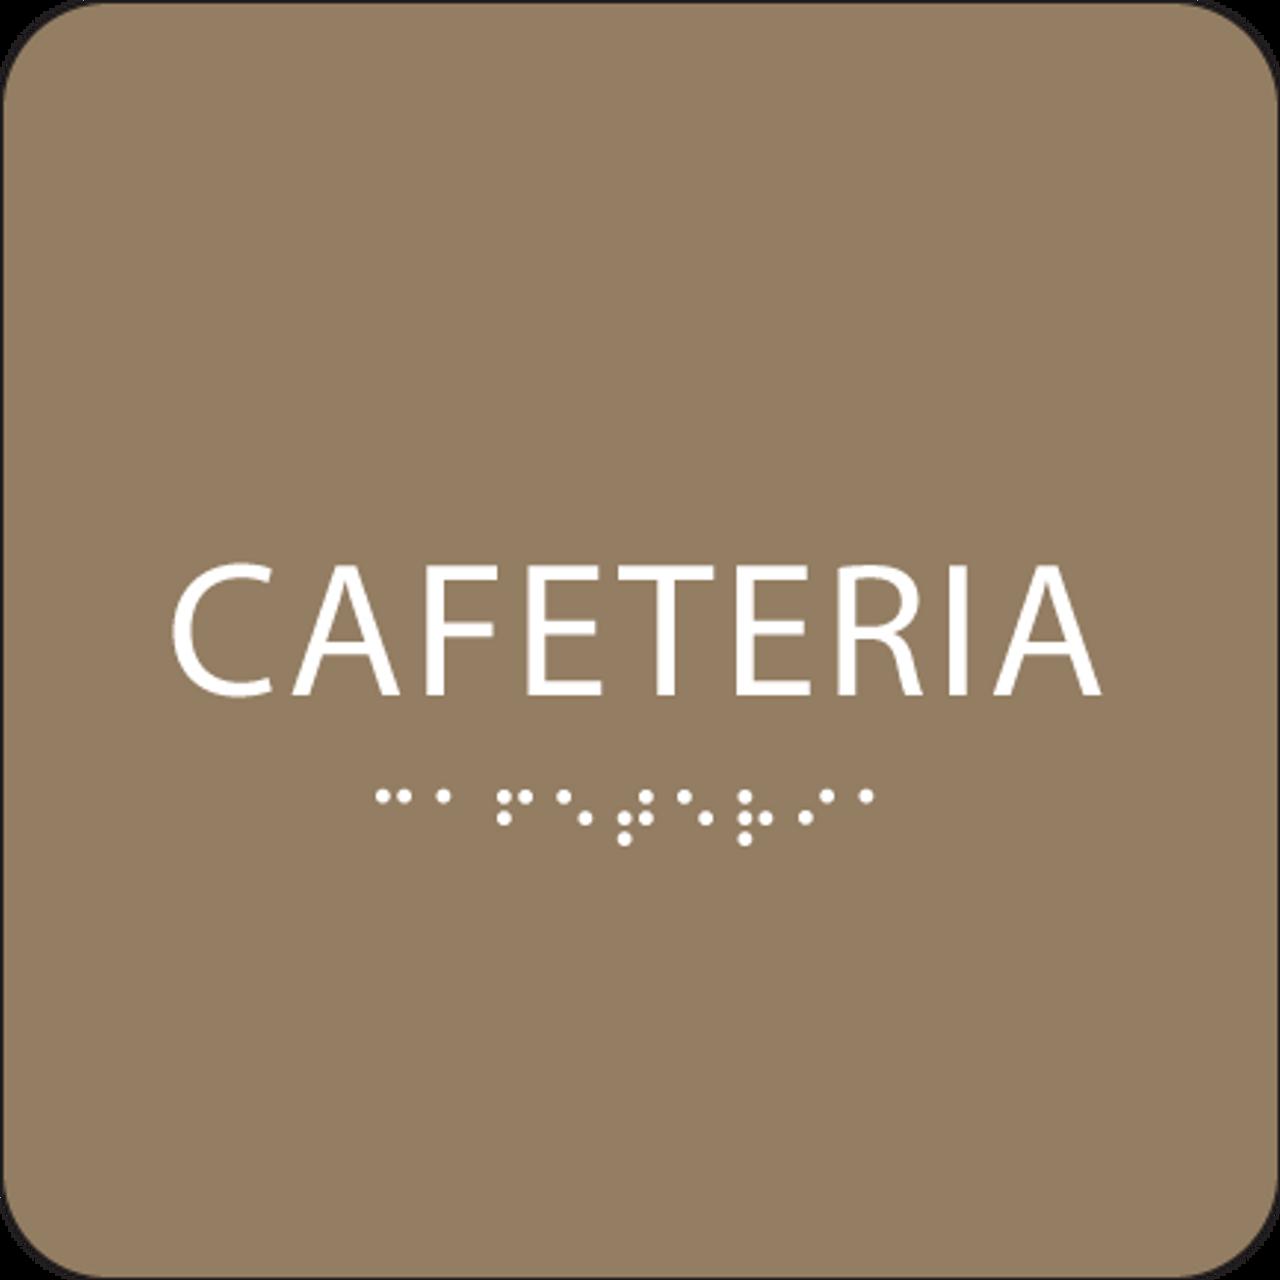 Brown Cafeteria ADA Sign